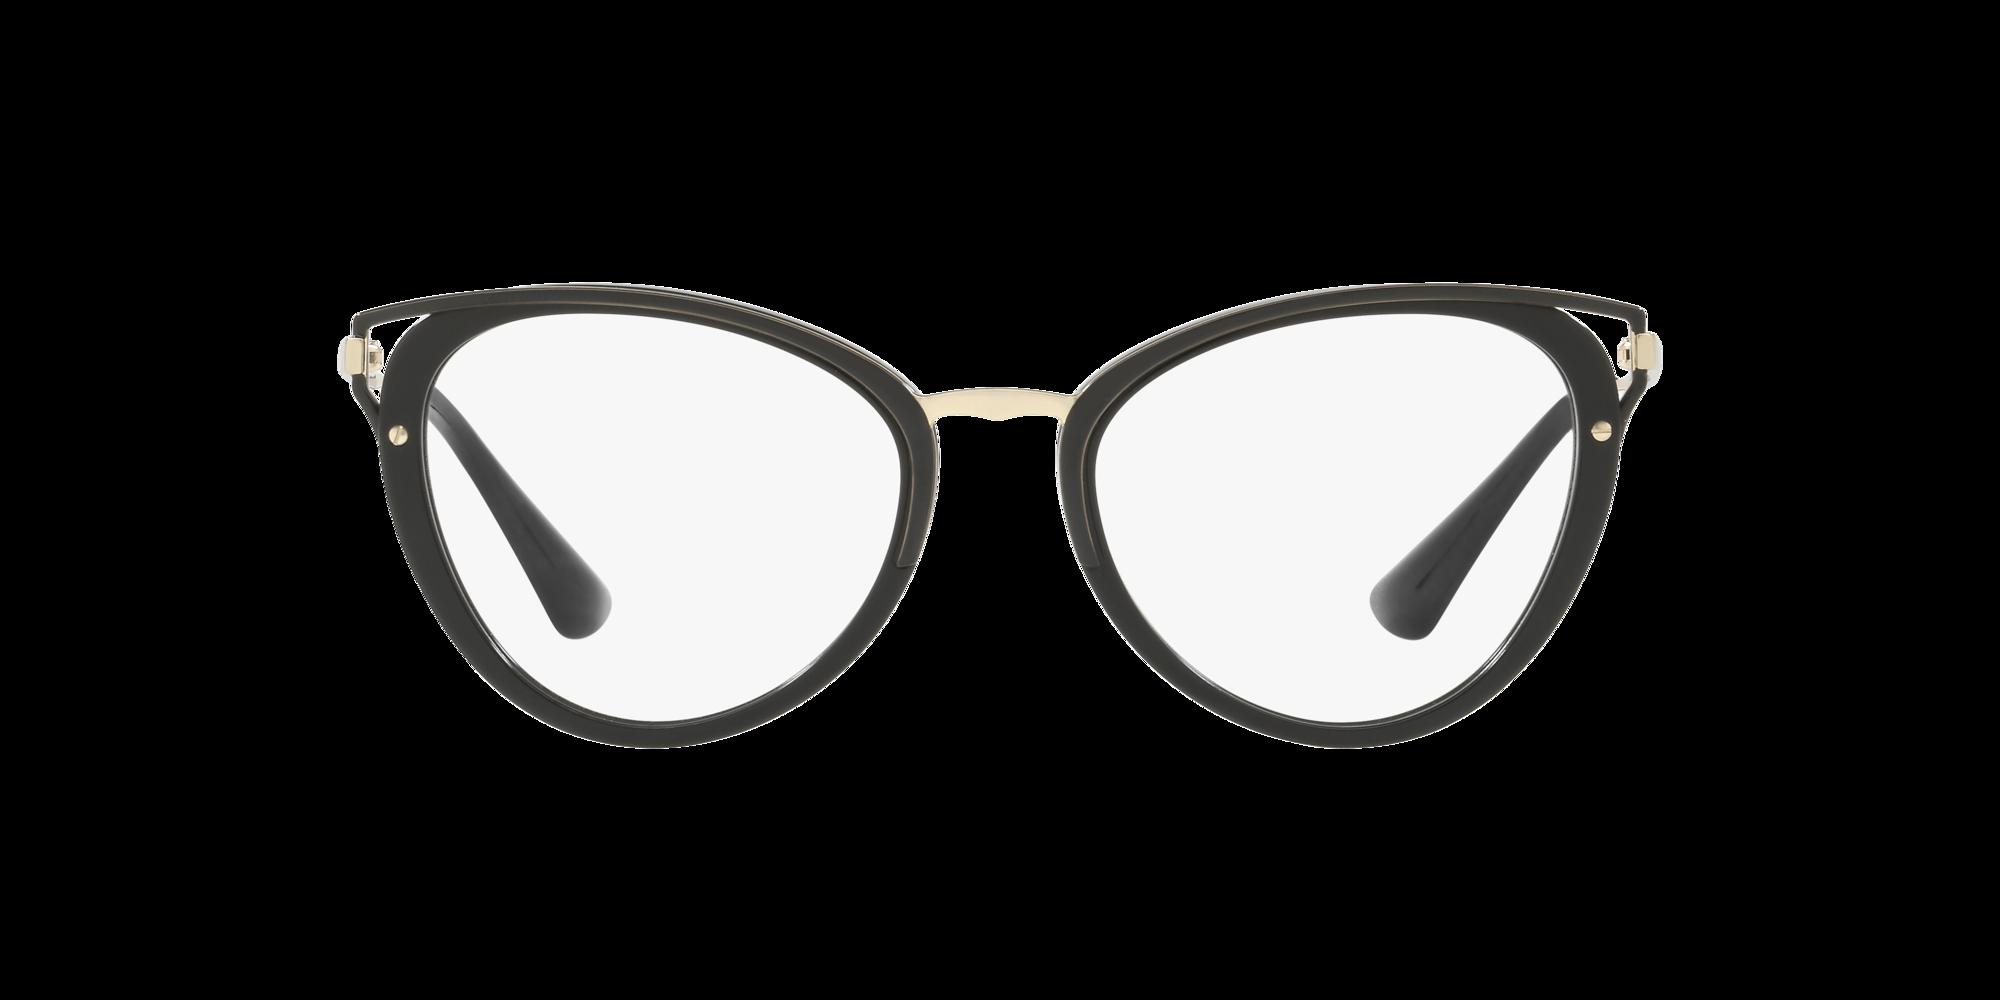 Image for PR 53UV CATWALK from LensCrafters | Glasses, Prescription Glasses Online, Eyewear